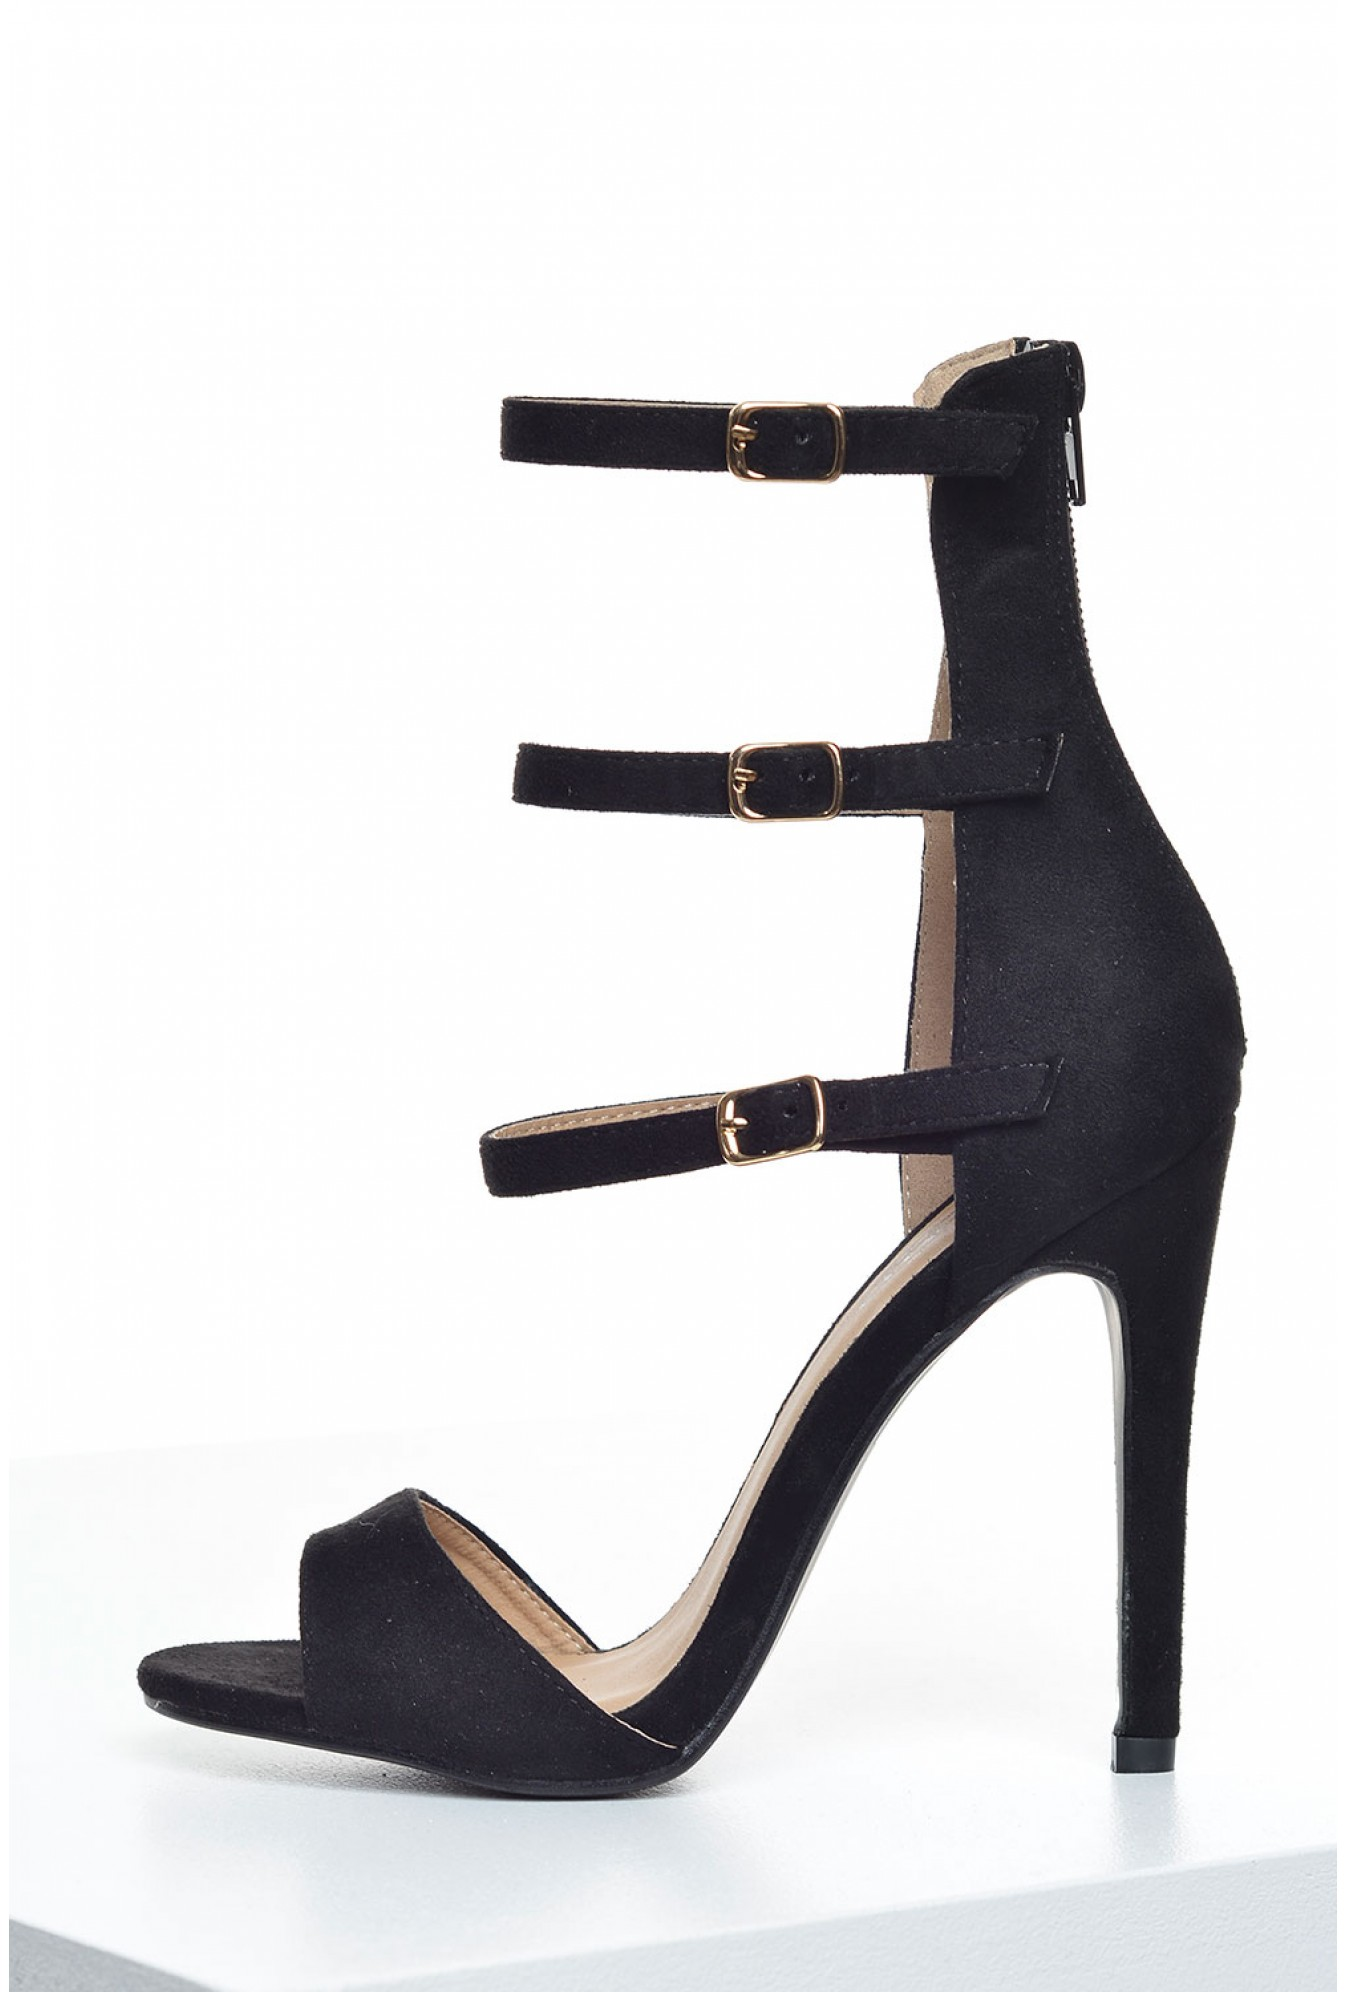 684cd1a801ba3 Indigo Footwear Pricilla Ankle Strap Sandals in Black Suede